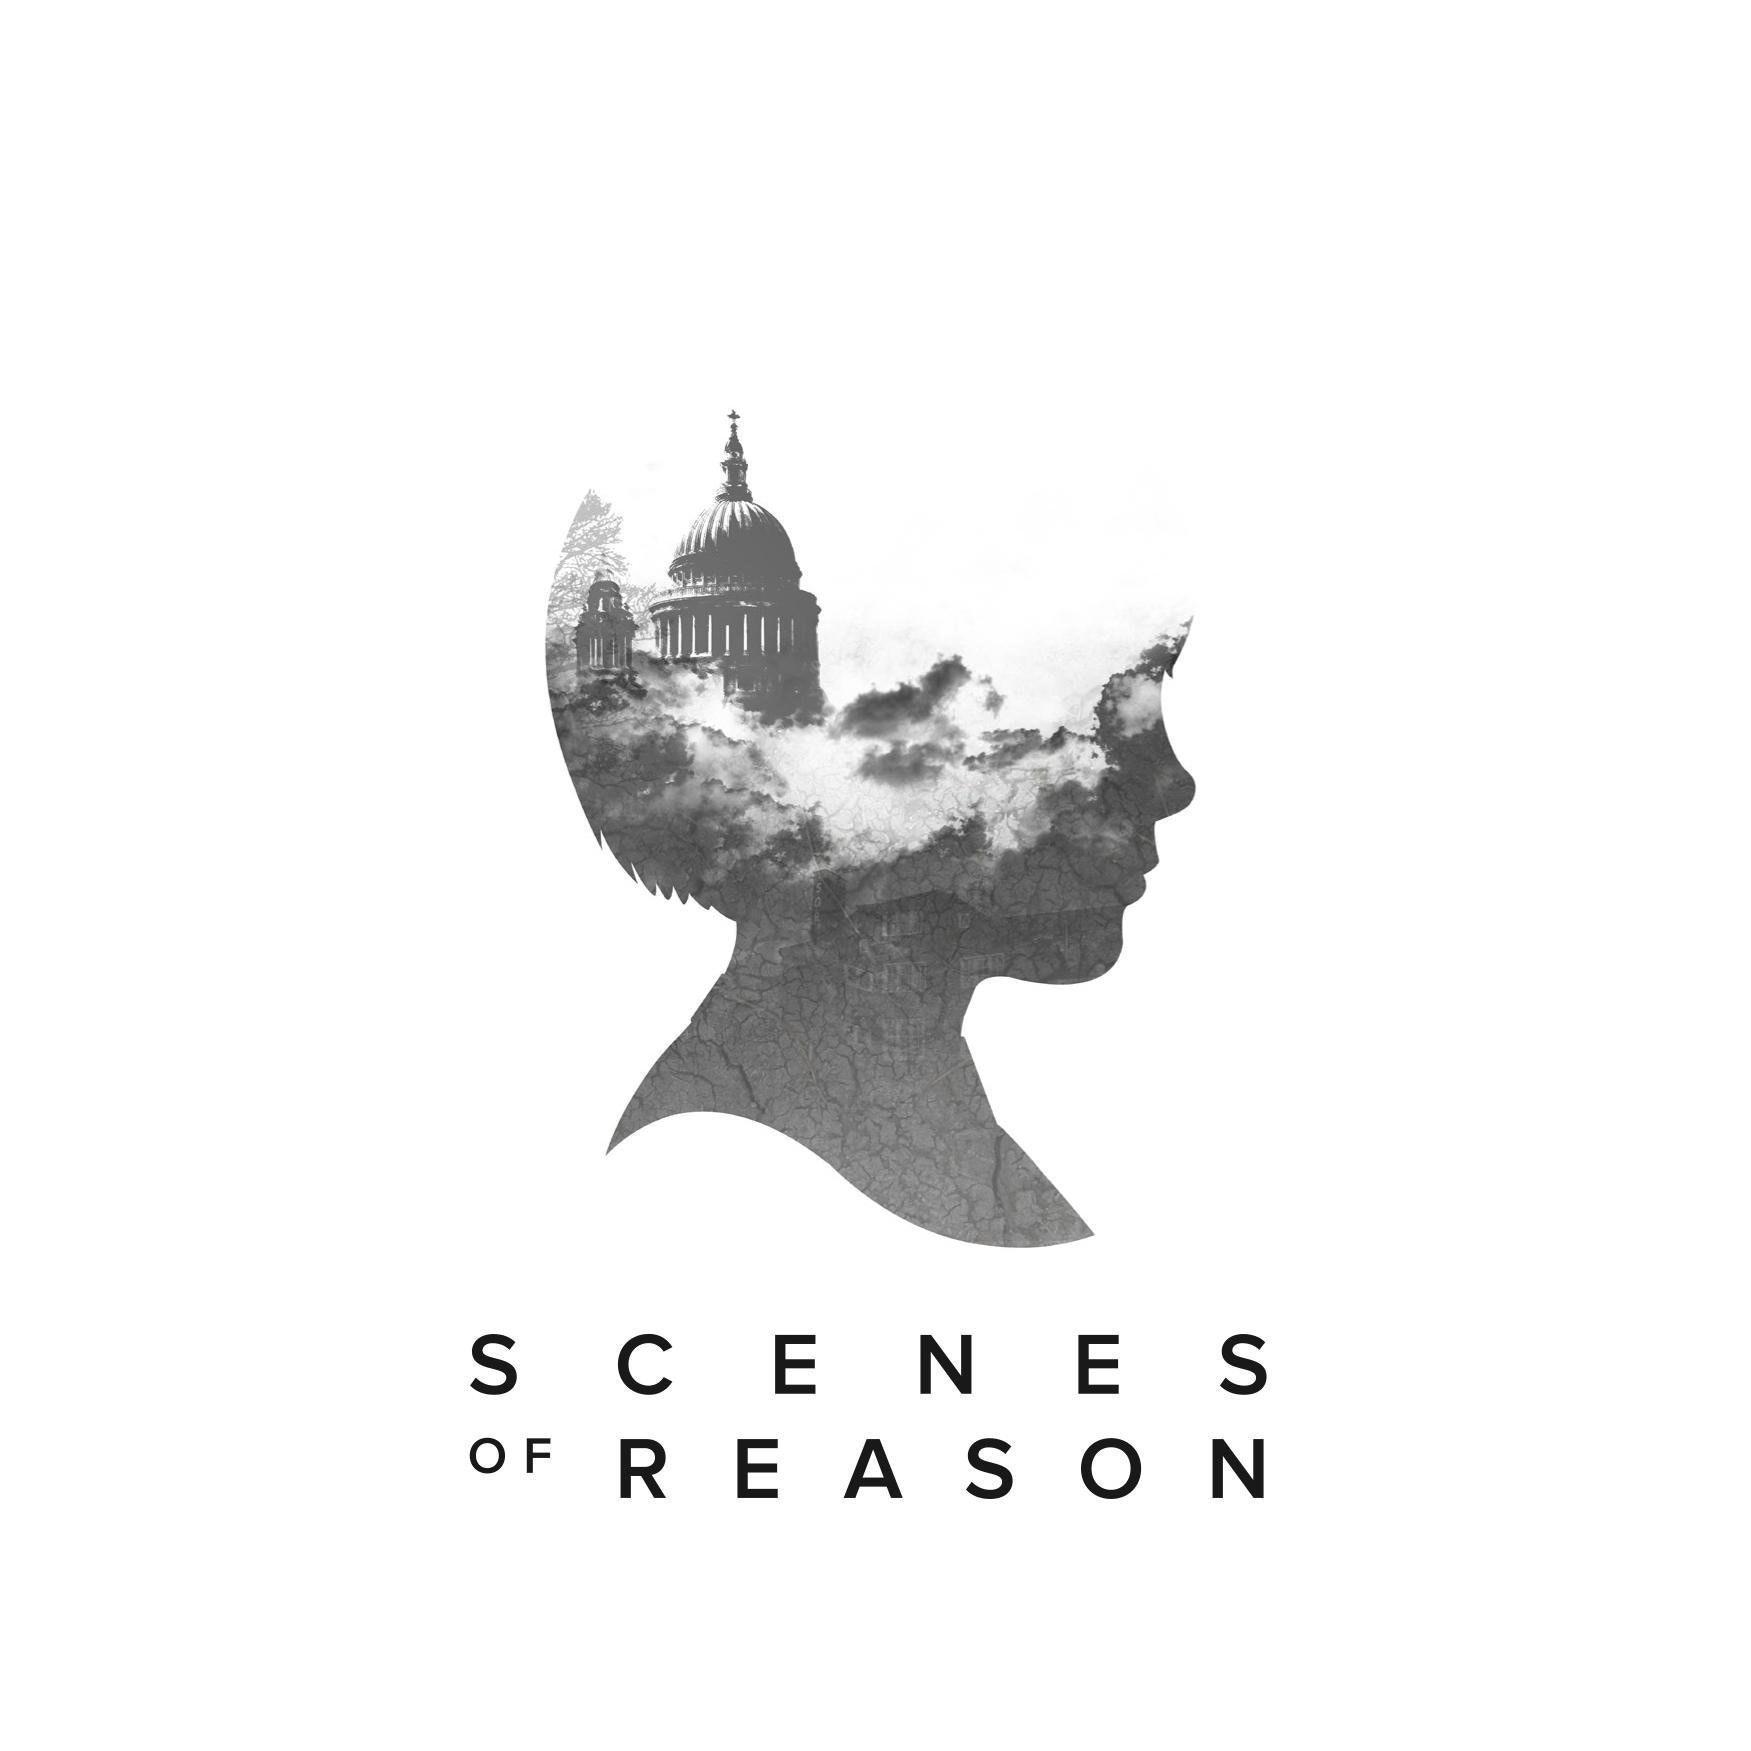 Scenes of Reason